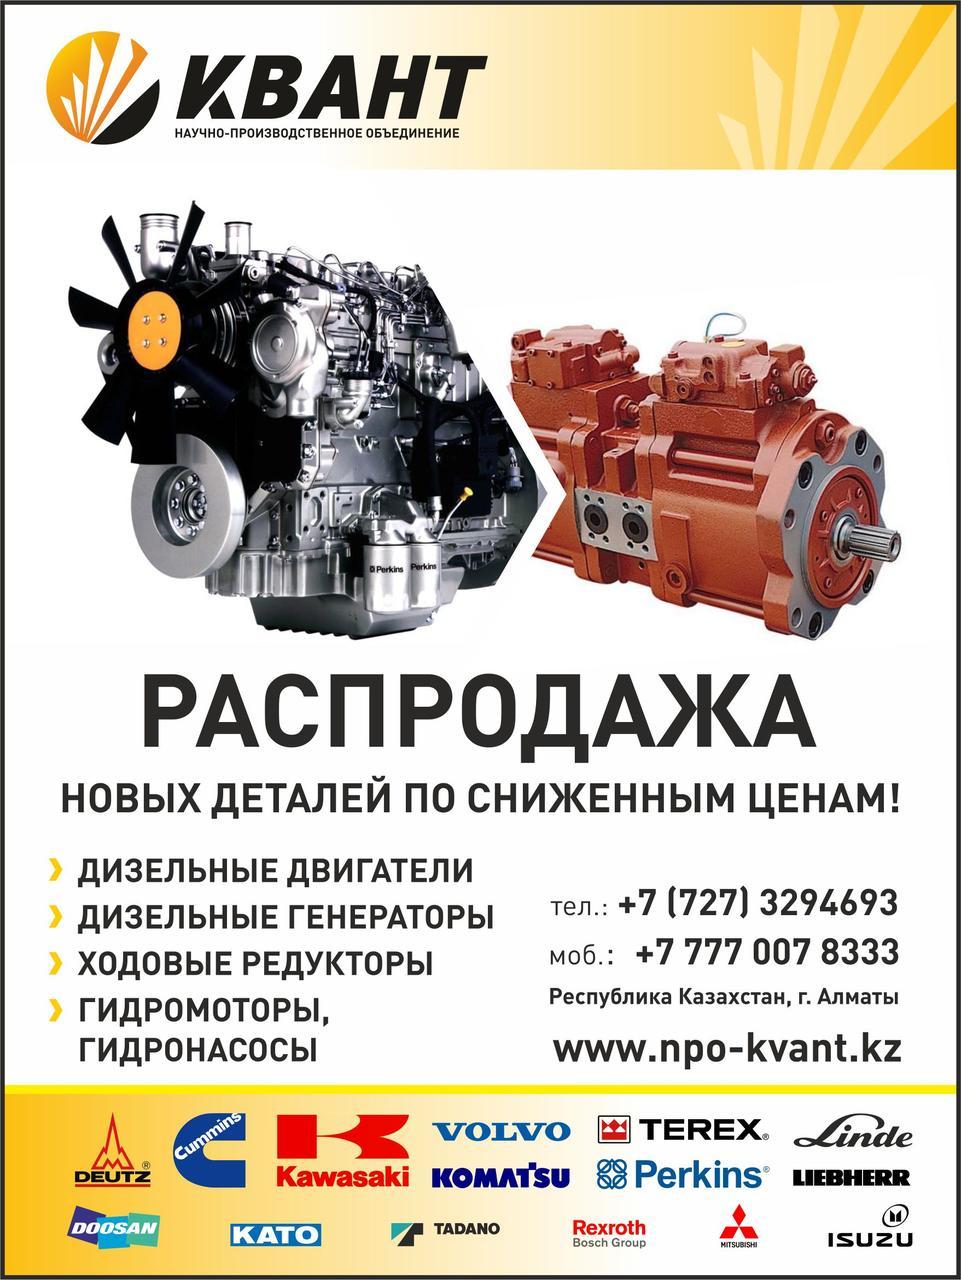 Двигатель Deutz 513, 912, Deutz 913, Deutz 914, Deutz 1013, Deutz 1015, Deutz 2011, Deutz 2012, Deutz 2013